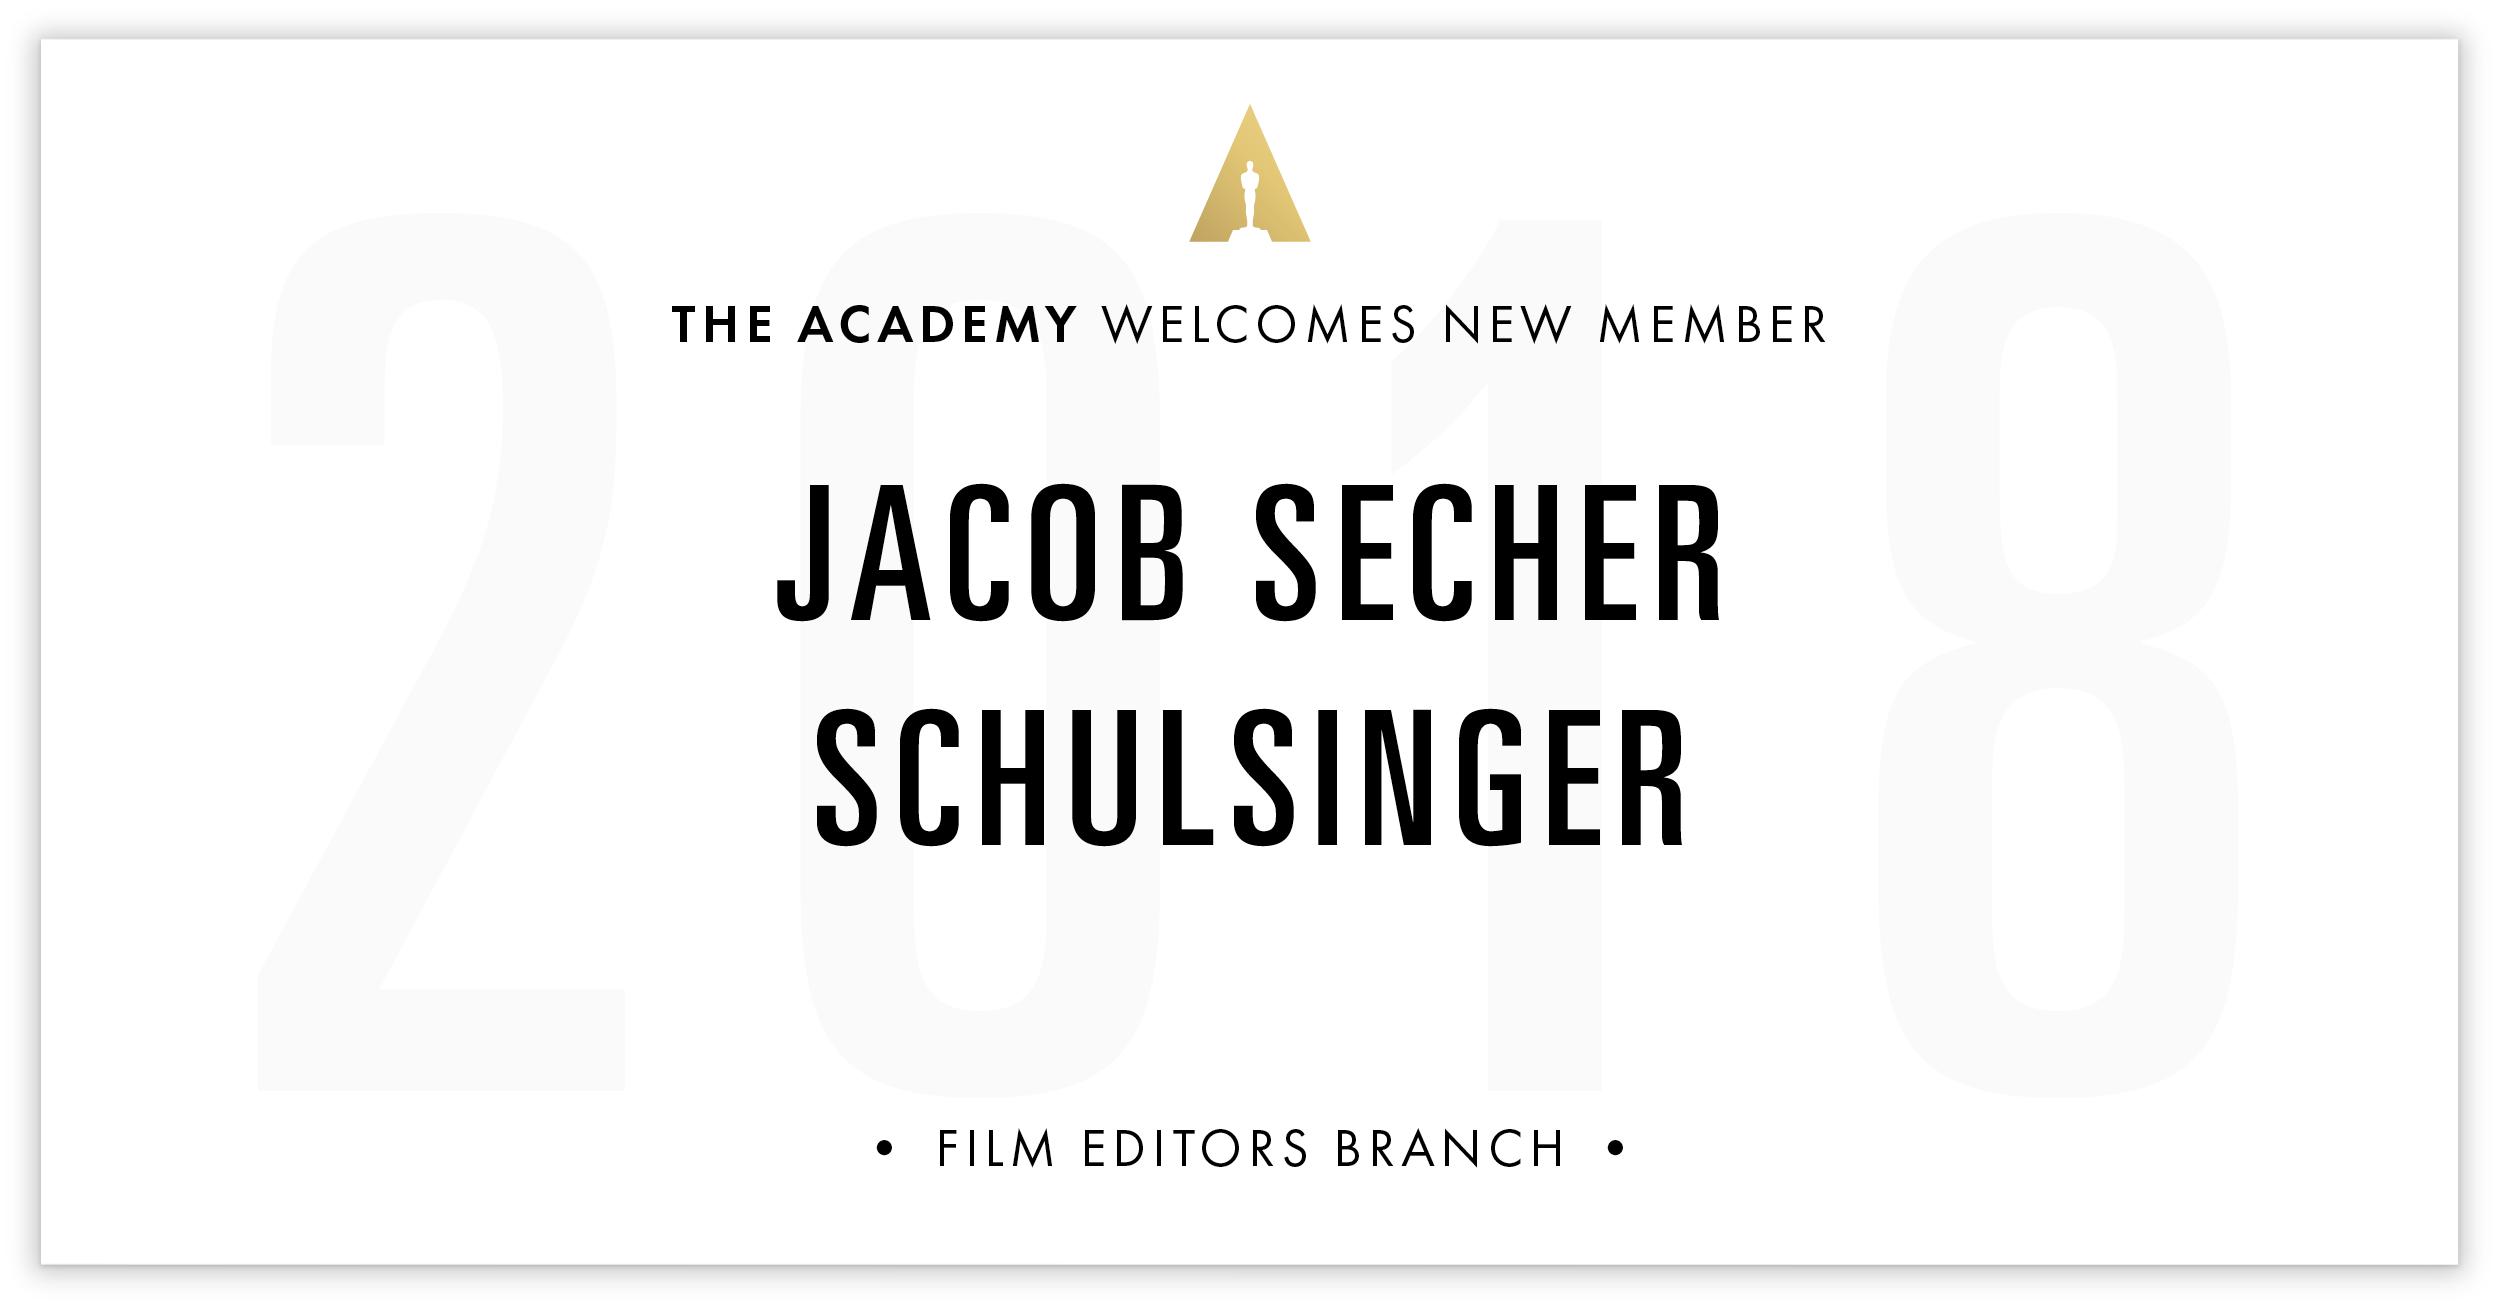 Jacob Schulsinger is invited!